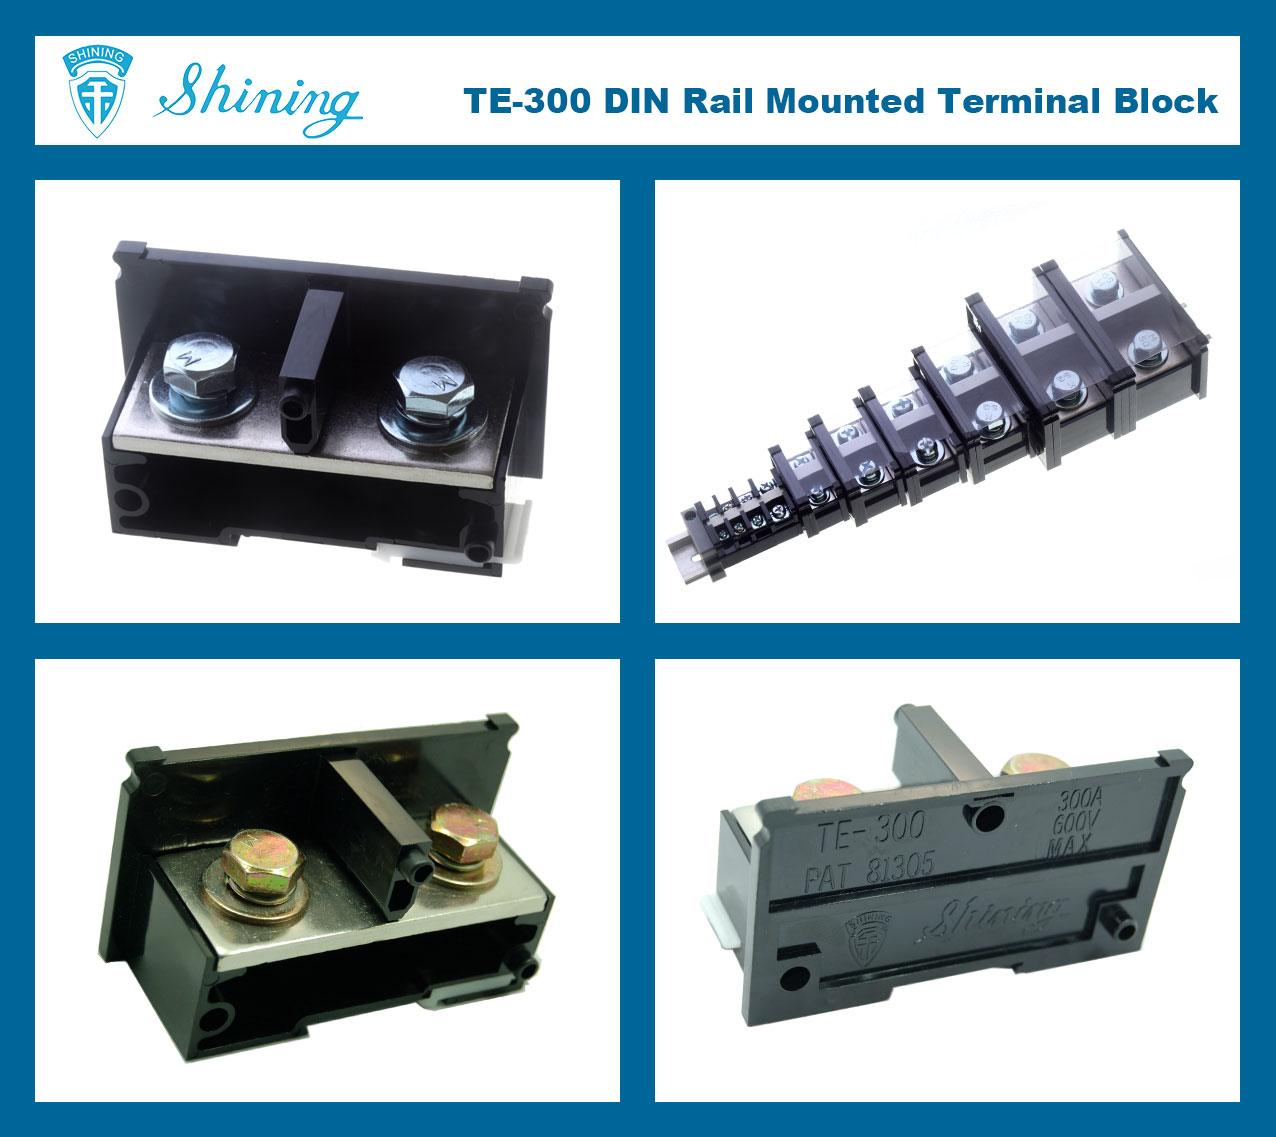 SHINING-TE-300 35mm Din Rail Mounted Assembly Type 600V 300A Terminal Strip